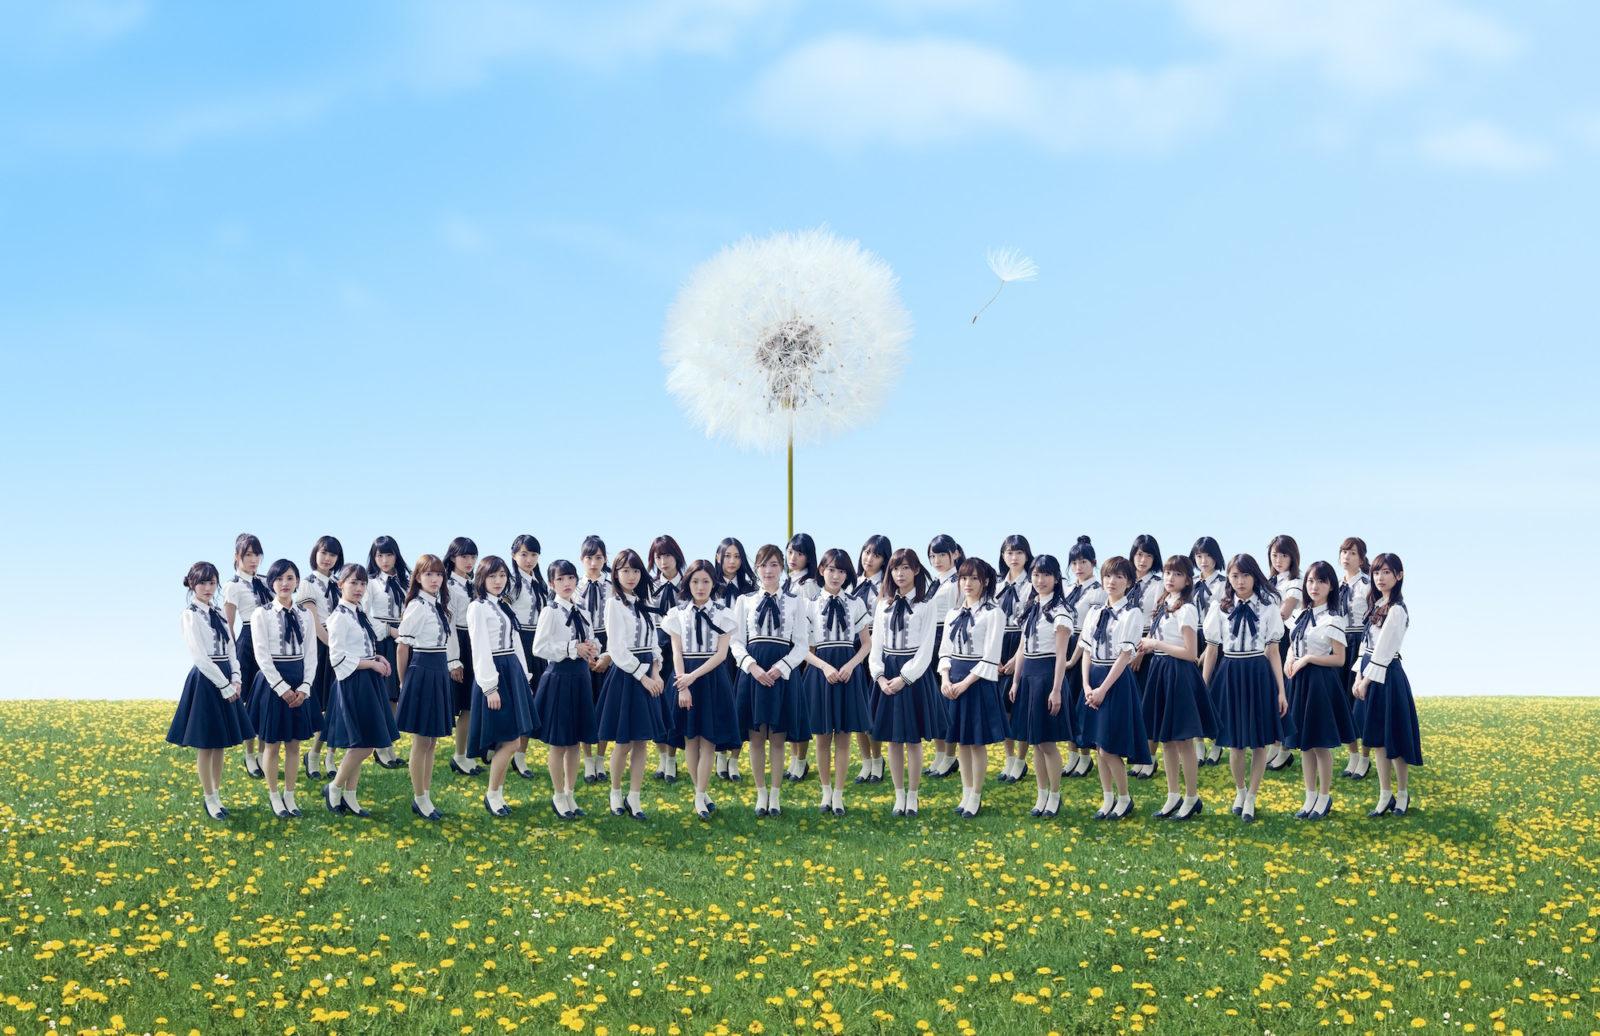 AKB48、本日から第9回選抜総選挙の投票開始!ファンも「投票した」「毎日100票ずつ投票」サムネイル画像